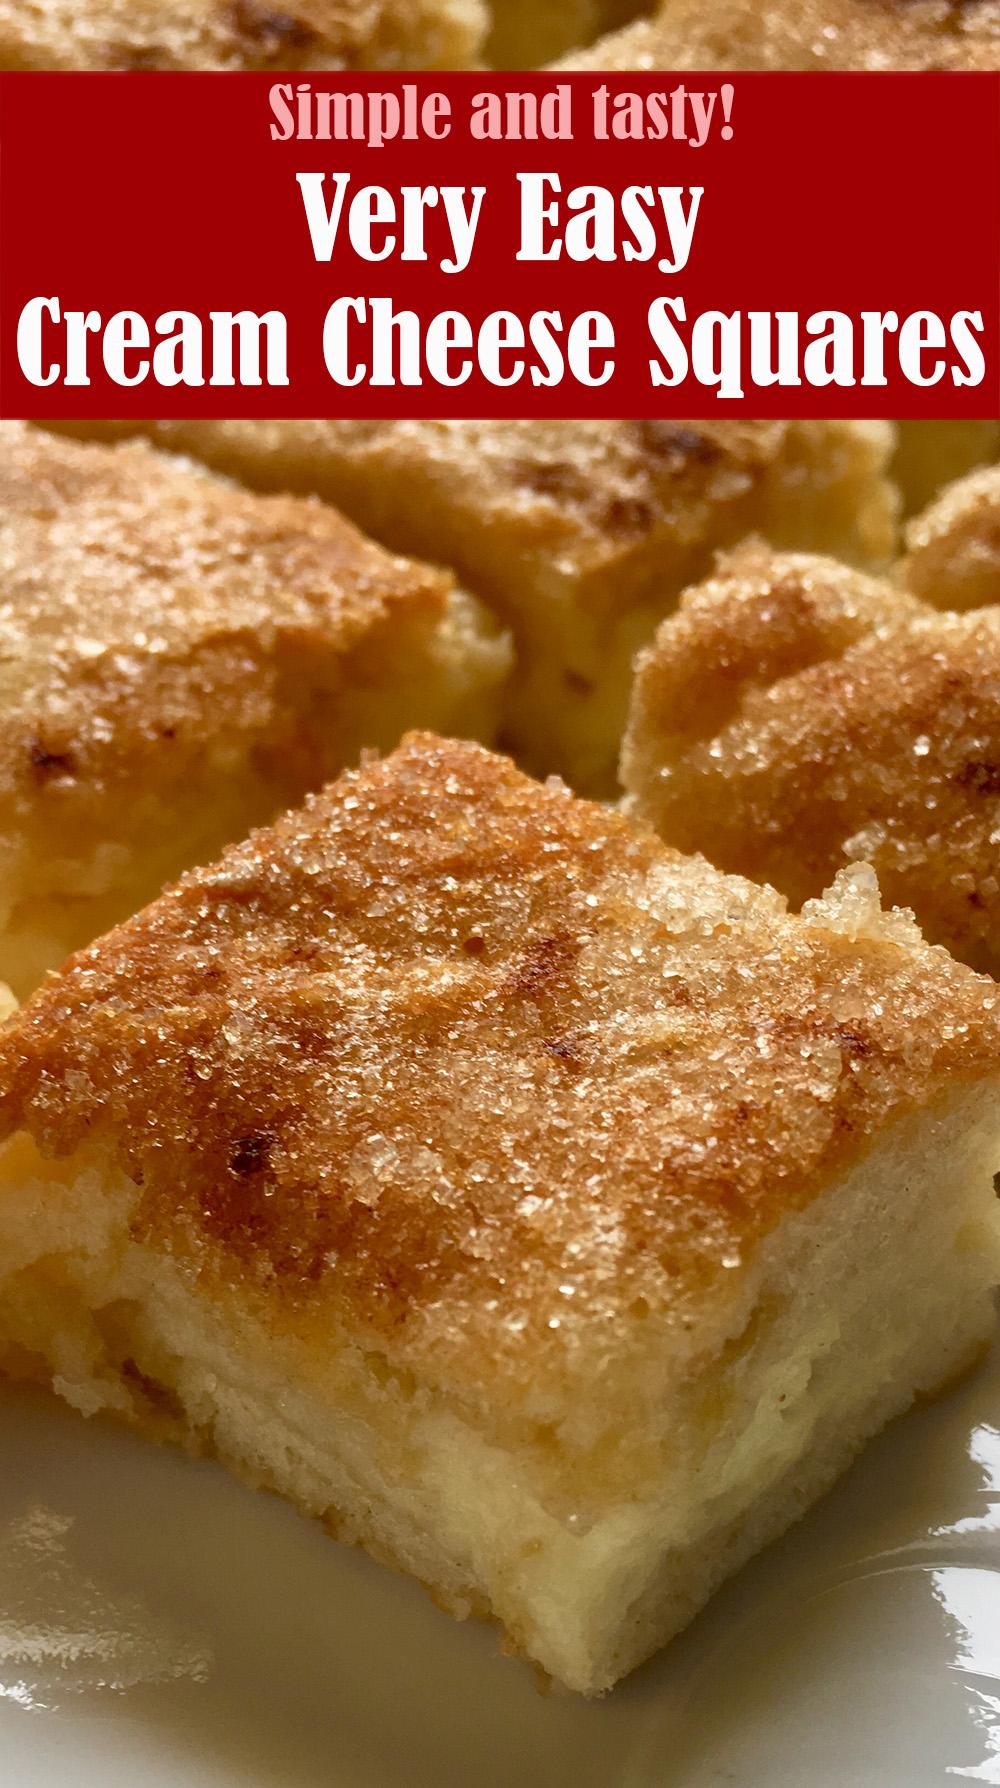 Easy Cream Cheese Squares